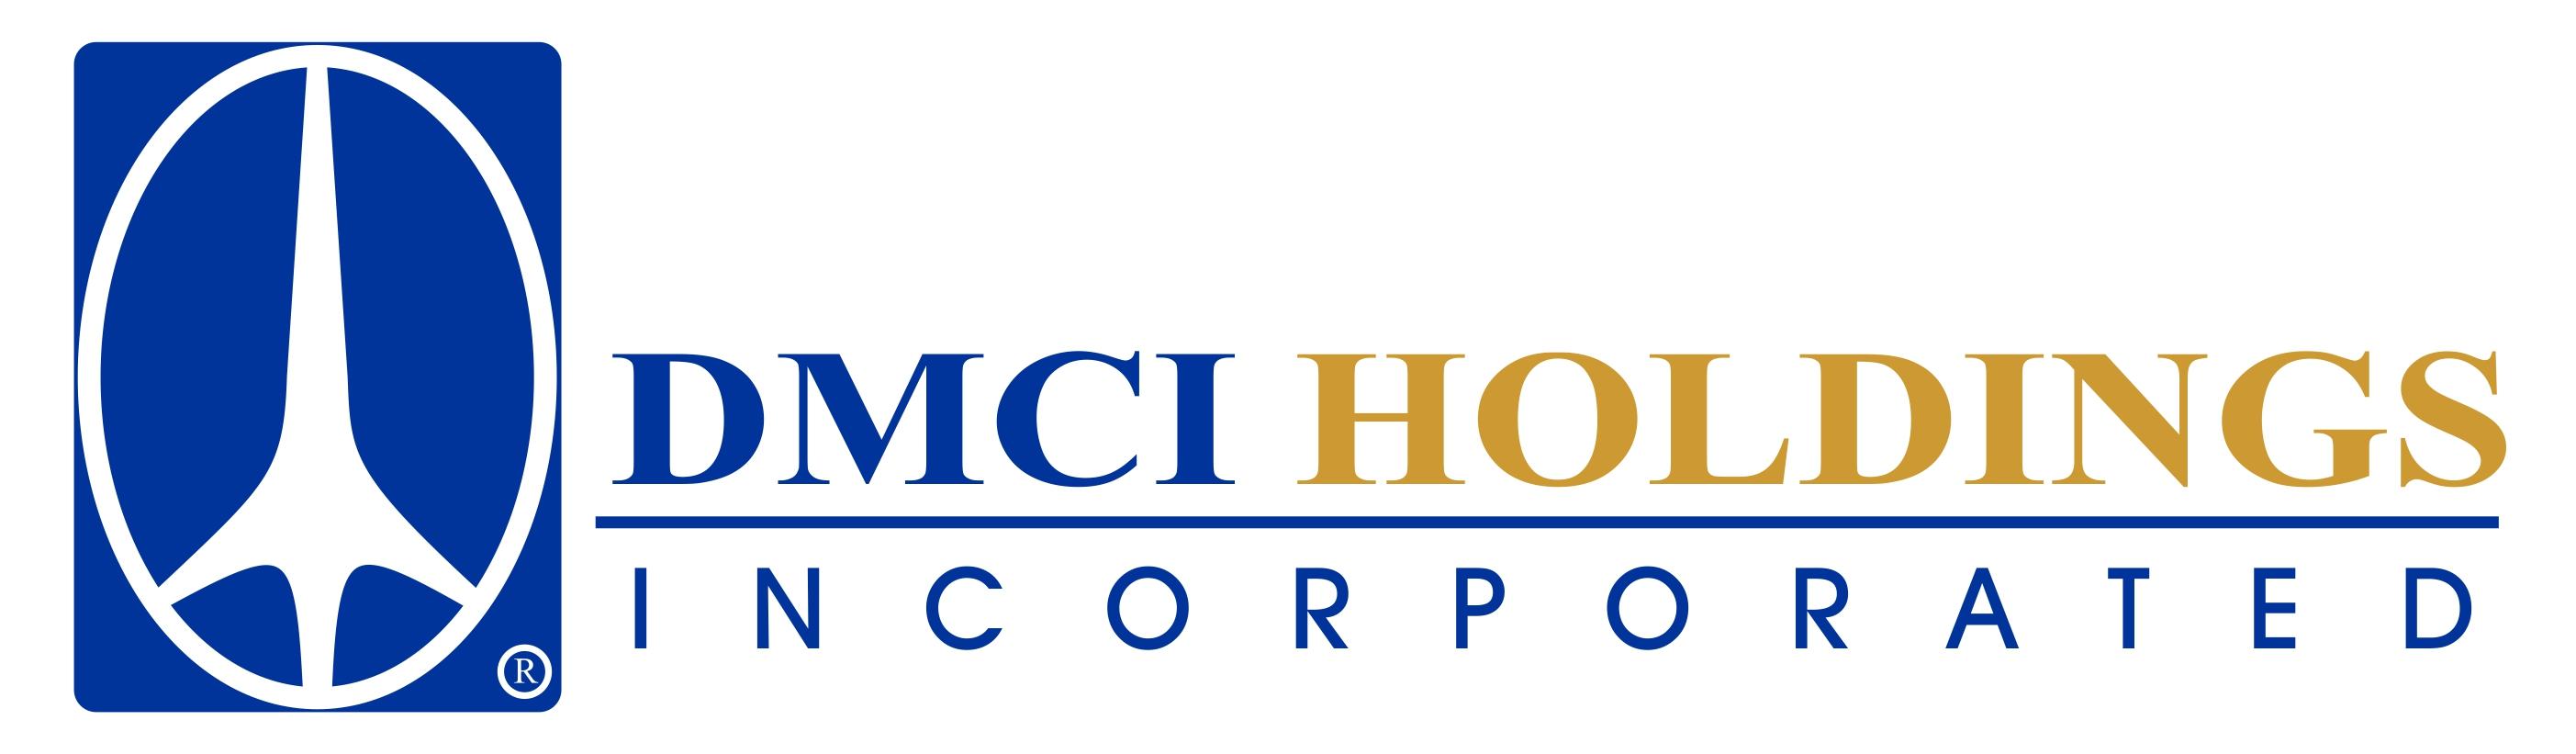 DMCI Holdings, Inc.